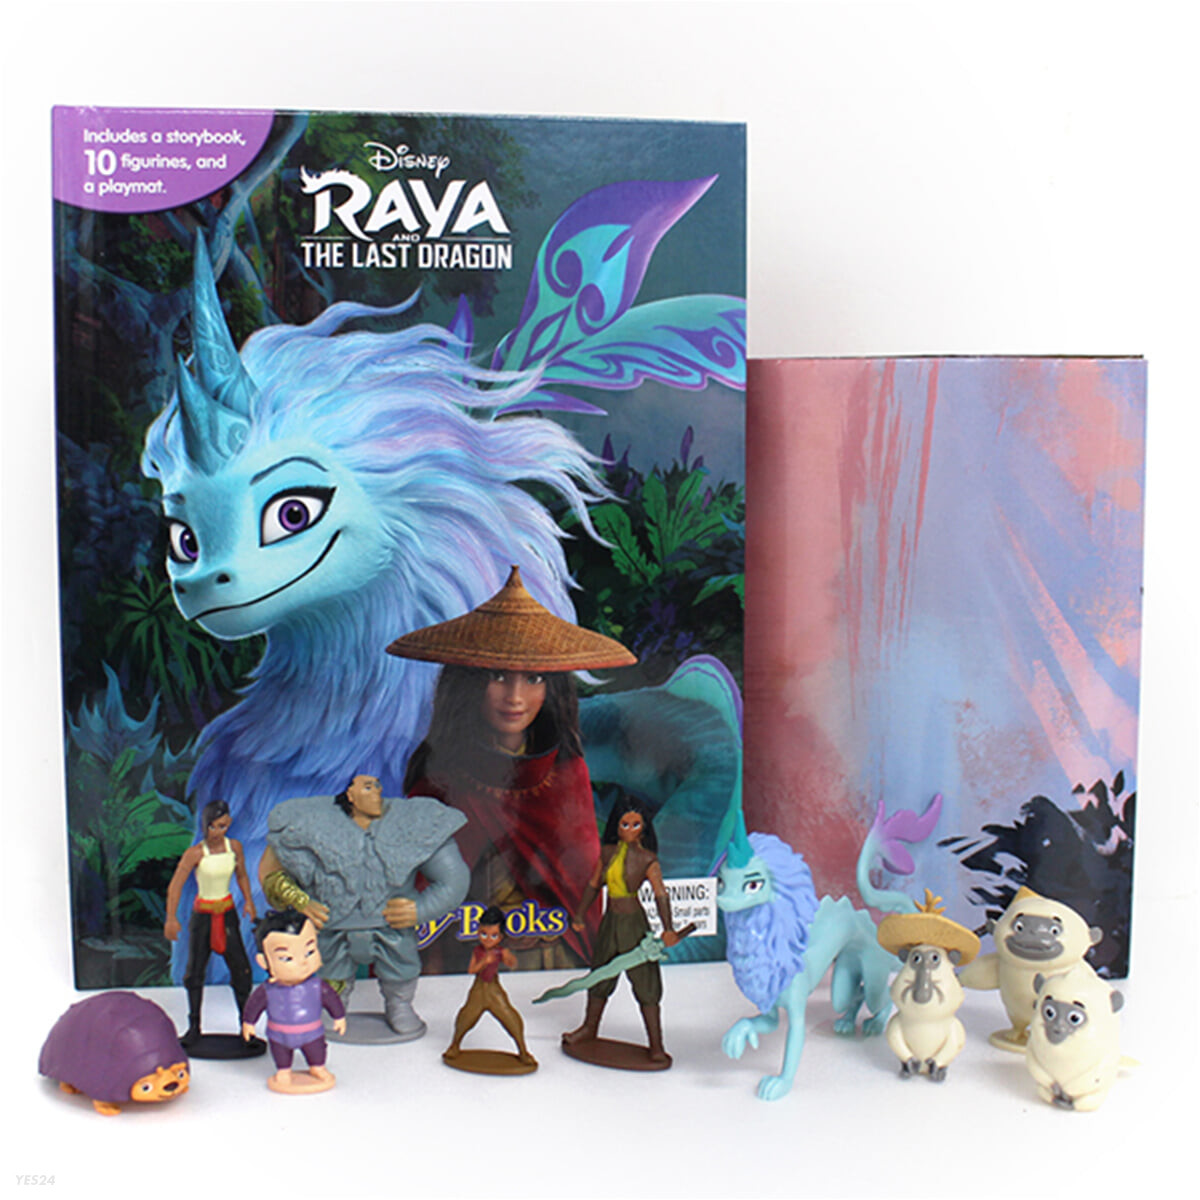 Disney Raya Last Dragon My Busy Books 디즈니 라야와 마지막 드래곤 비지북